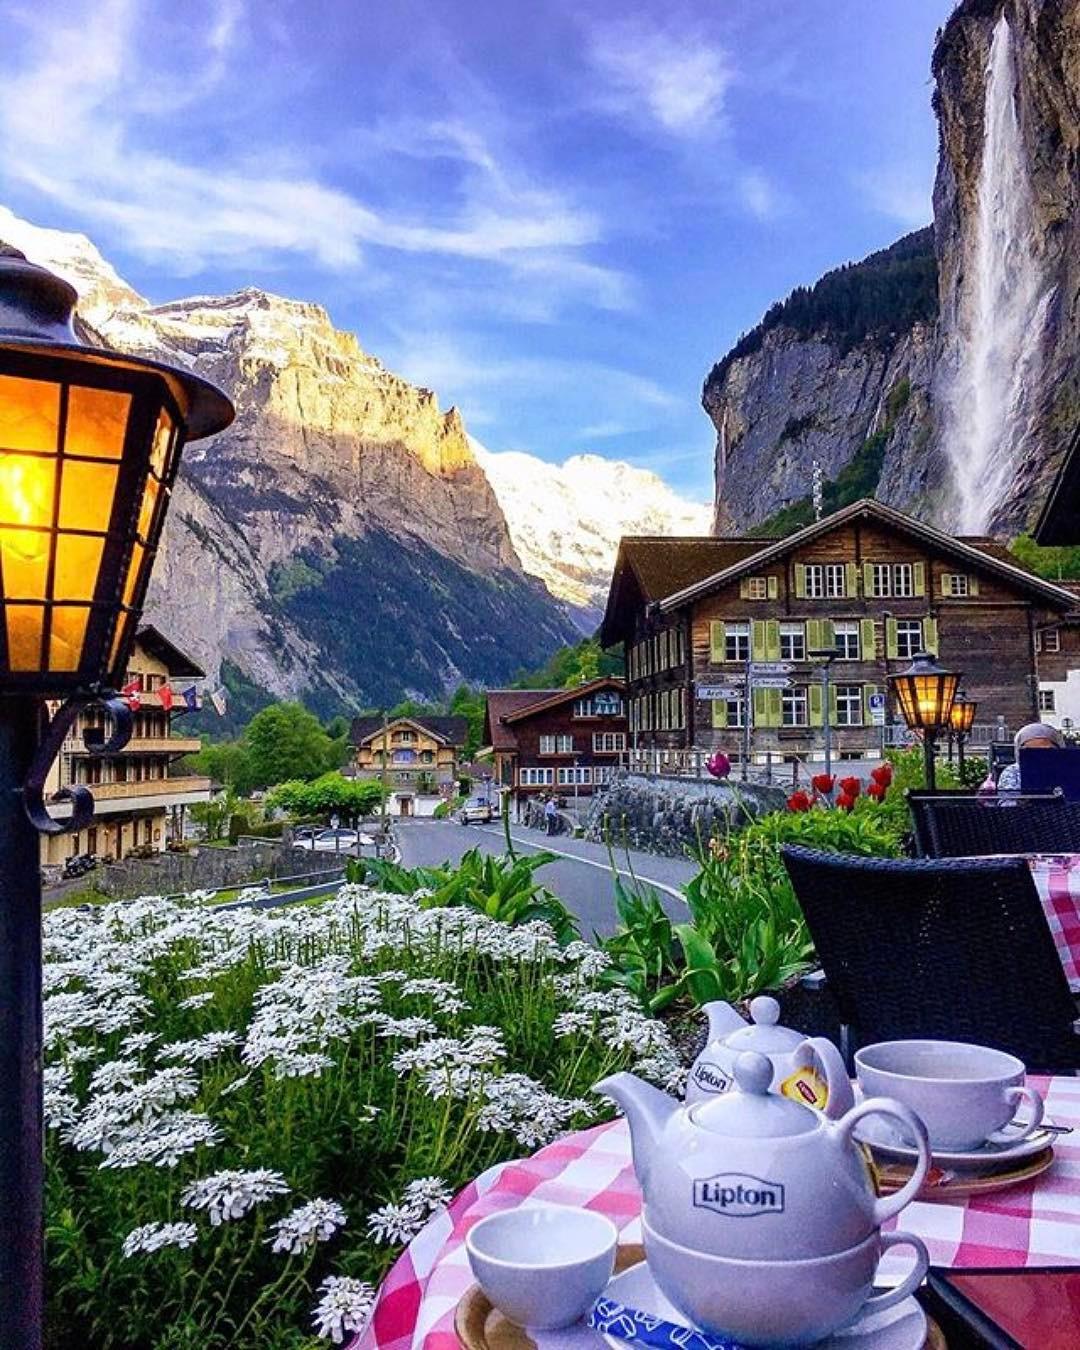 Switzerland Lauterbrunnen The Indulgence